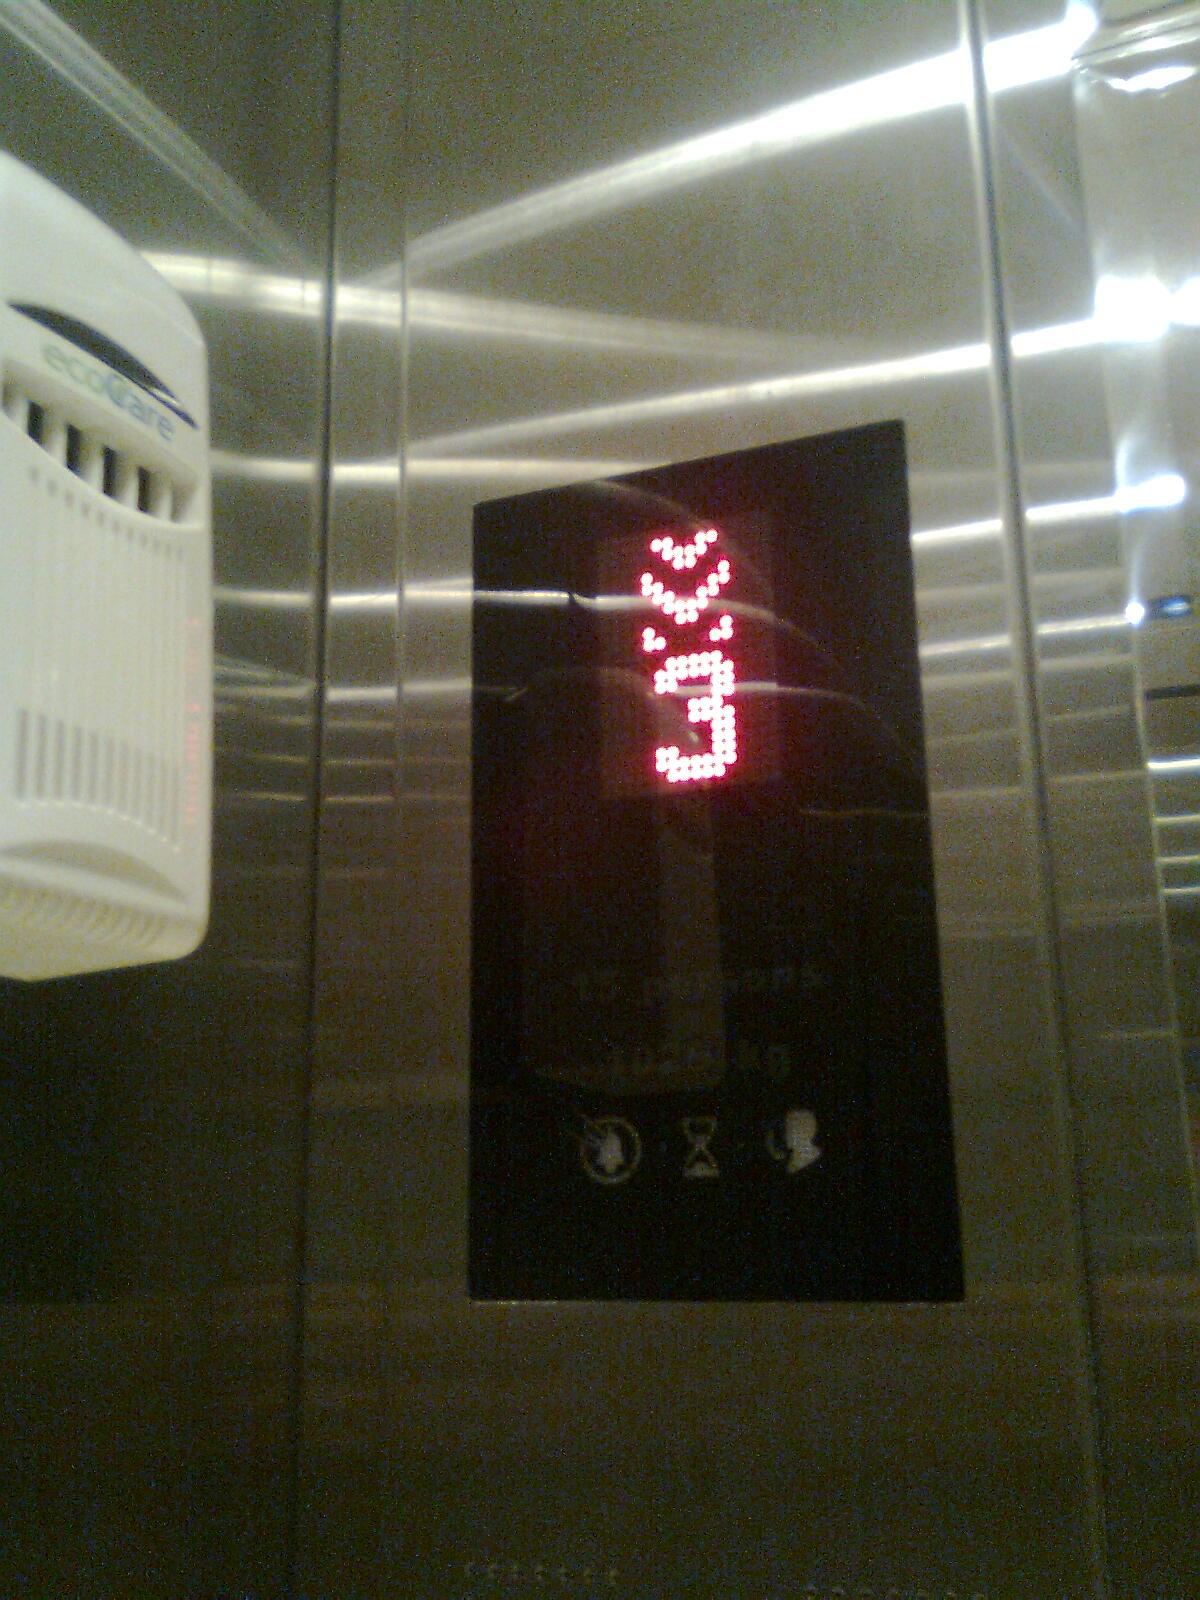 Thyssenkrupp Elevator Indicator Related Keywords & Suggestions